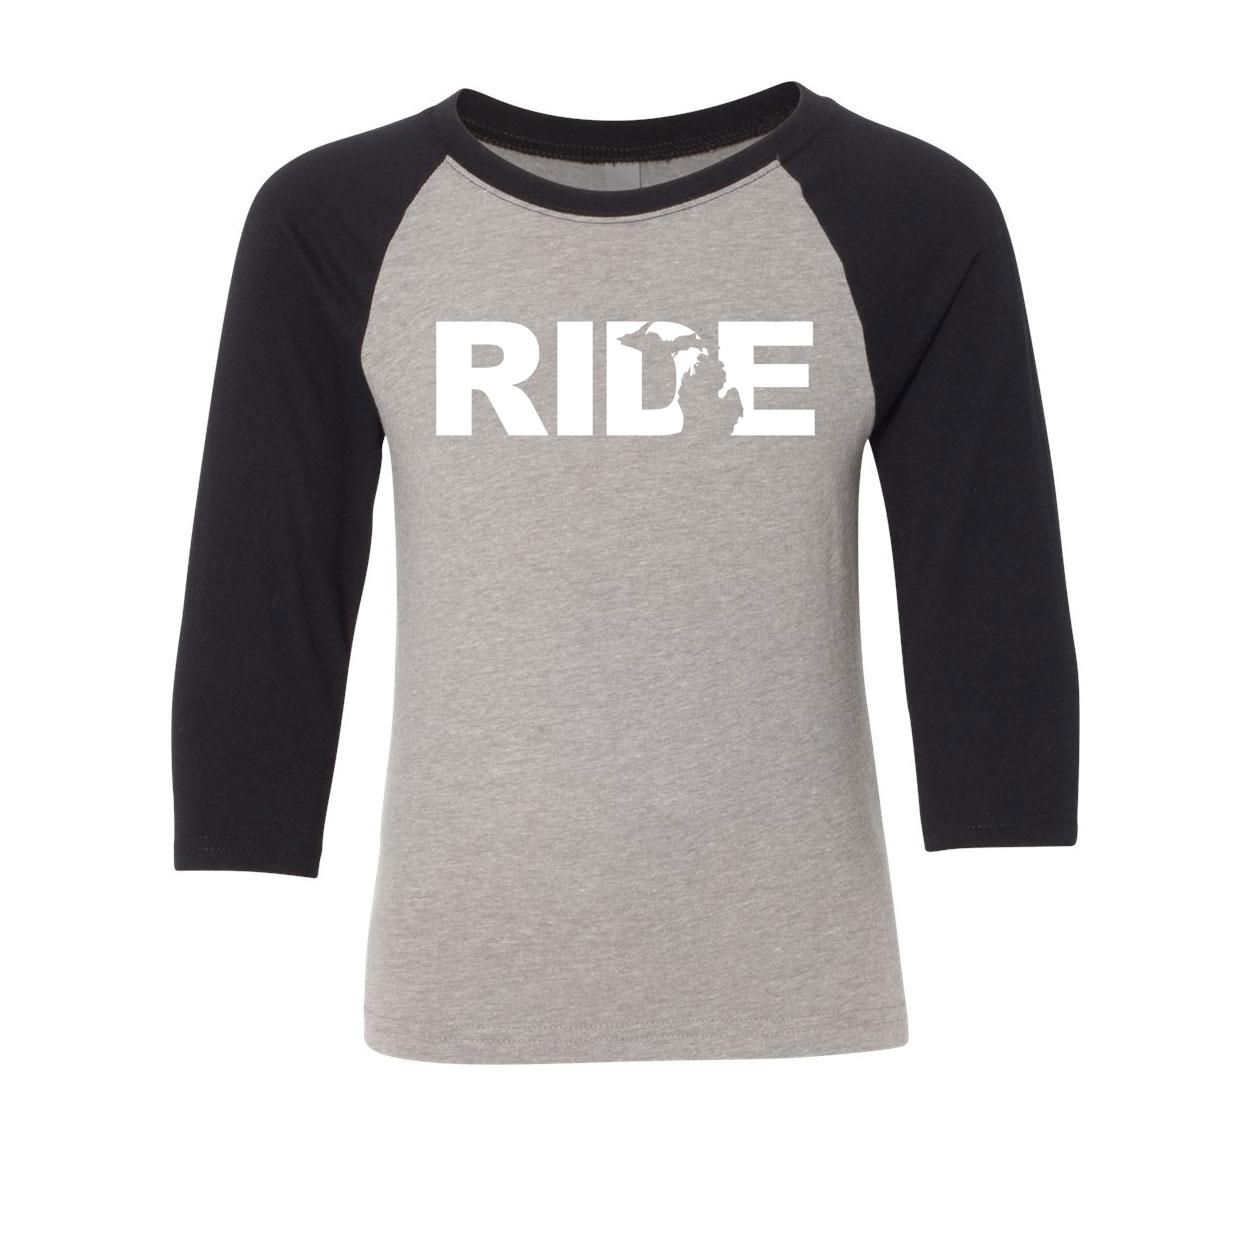 Ride Michigan Classic Youth Premium Raglan Shirt Gray/Black (White Logo)